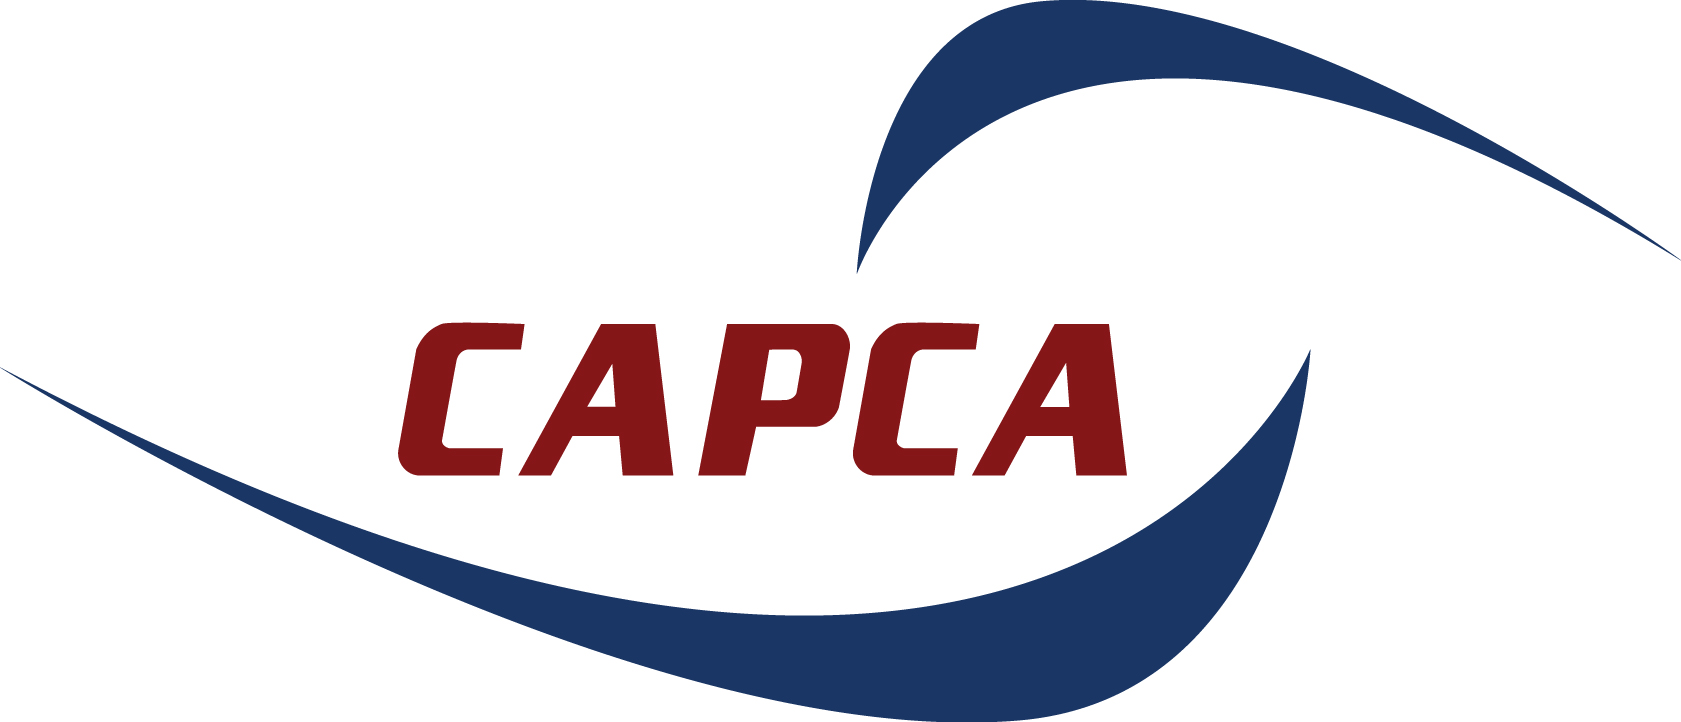 Canadian Association of Provincial Cancer Agencies (CAPCA) Logo